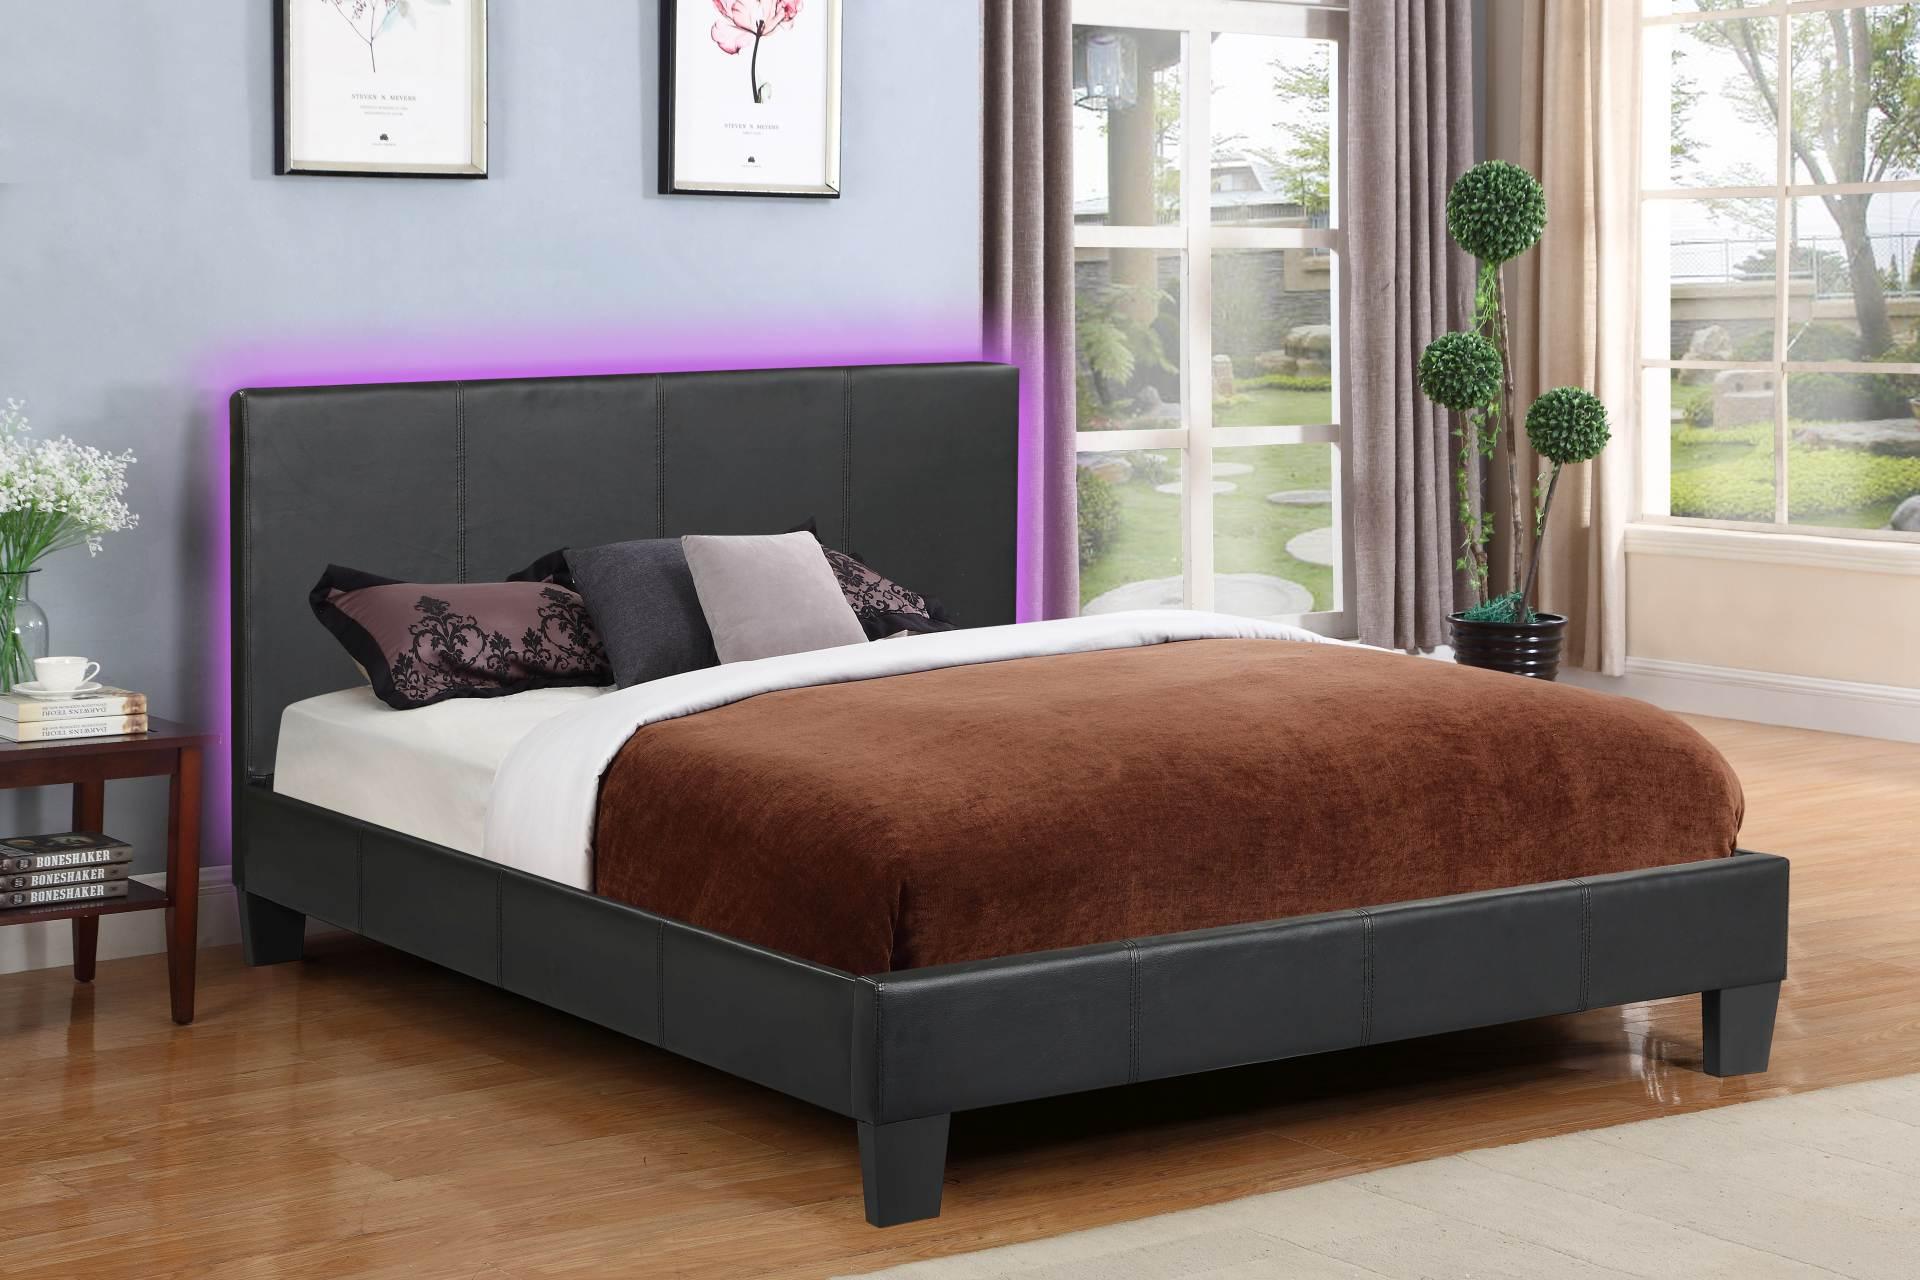 Value Upholstered Platform Bed Black Double Full